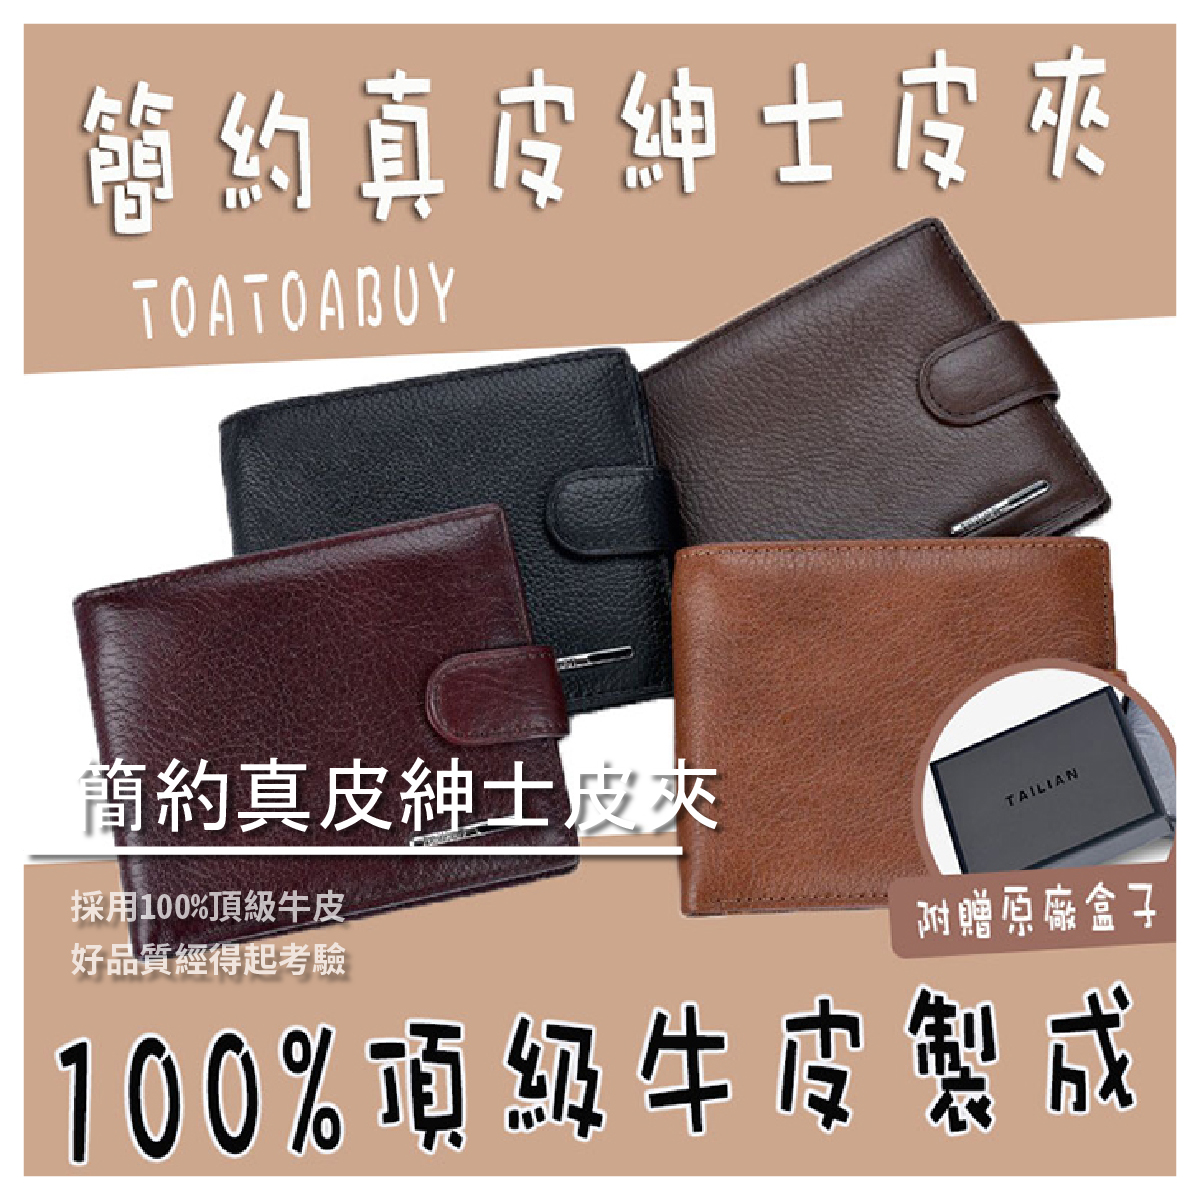 【TOATOABUY 托托買】簡約真皮紳士皮夾/9.5X12.2X2cm